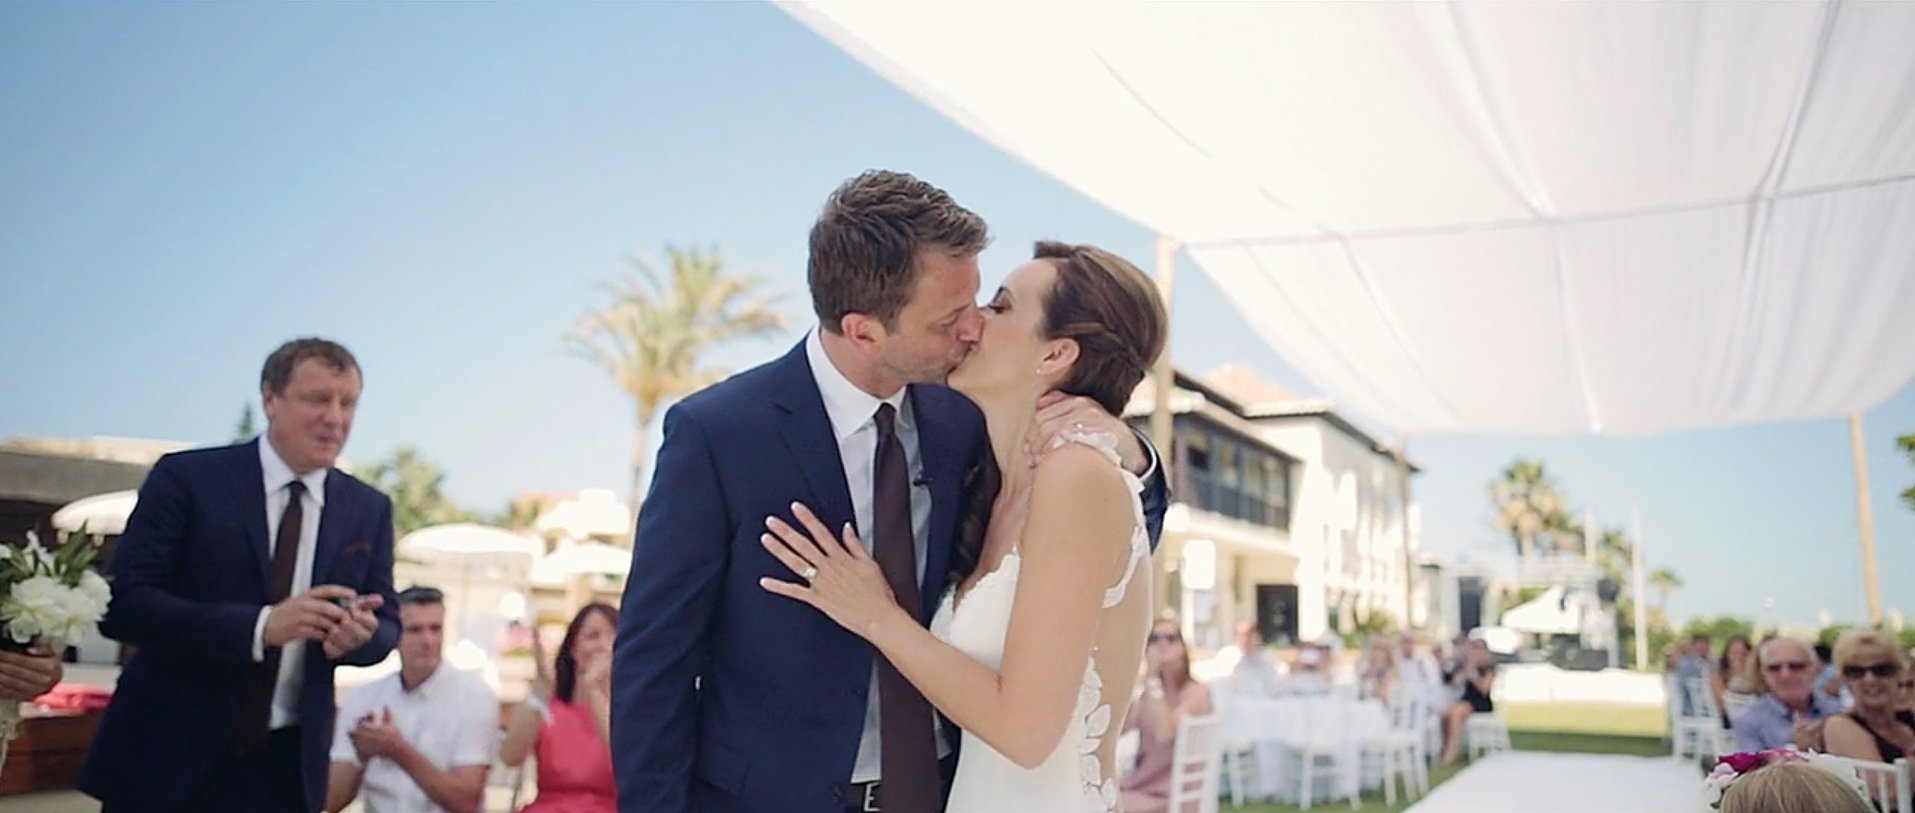 Destination Wedding Videographers Andalusia